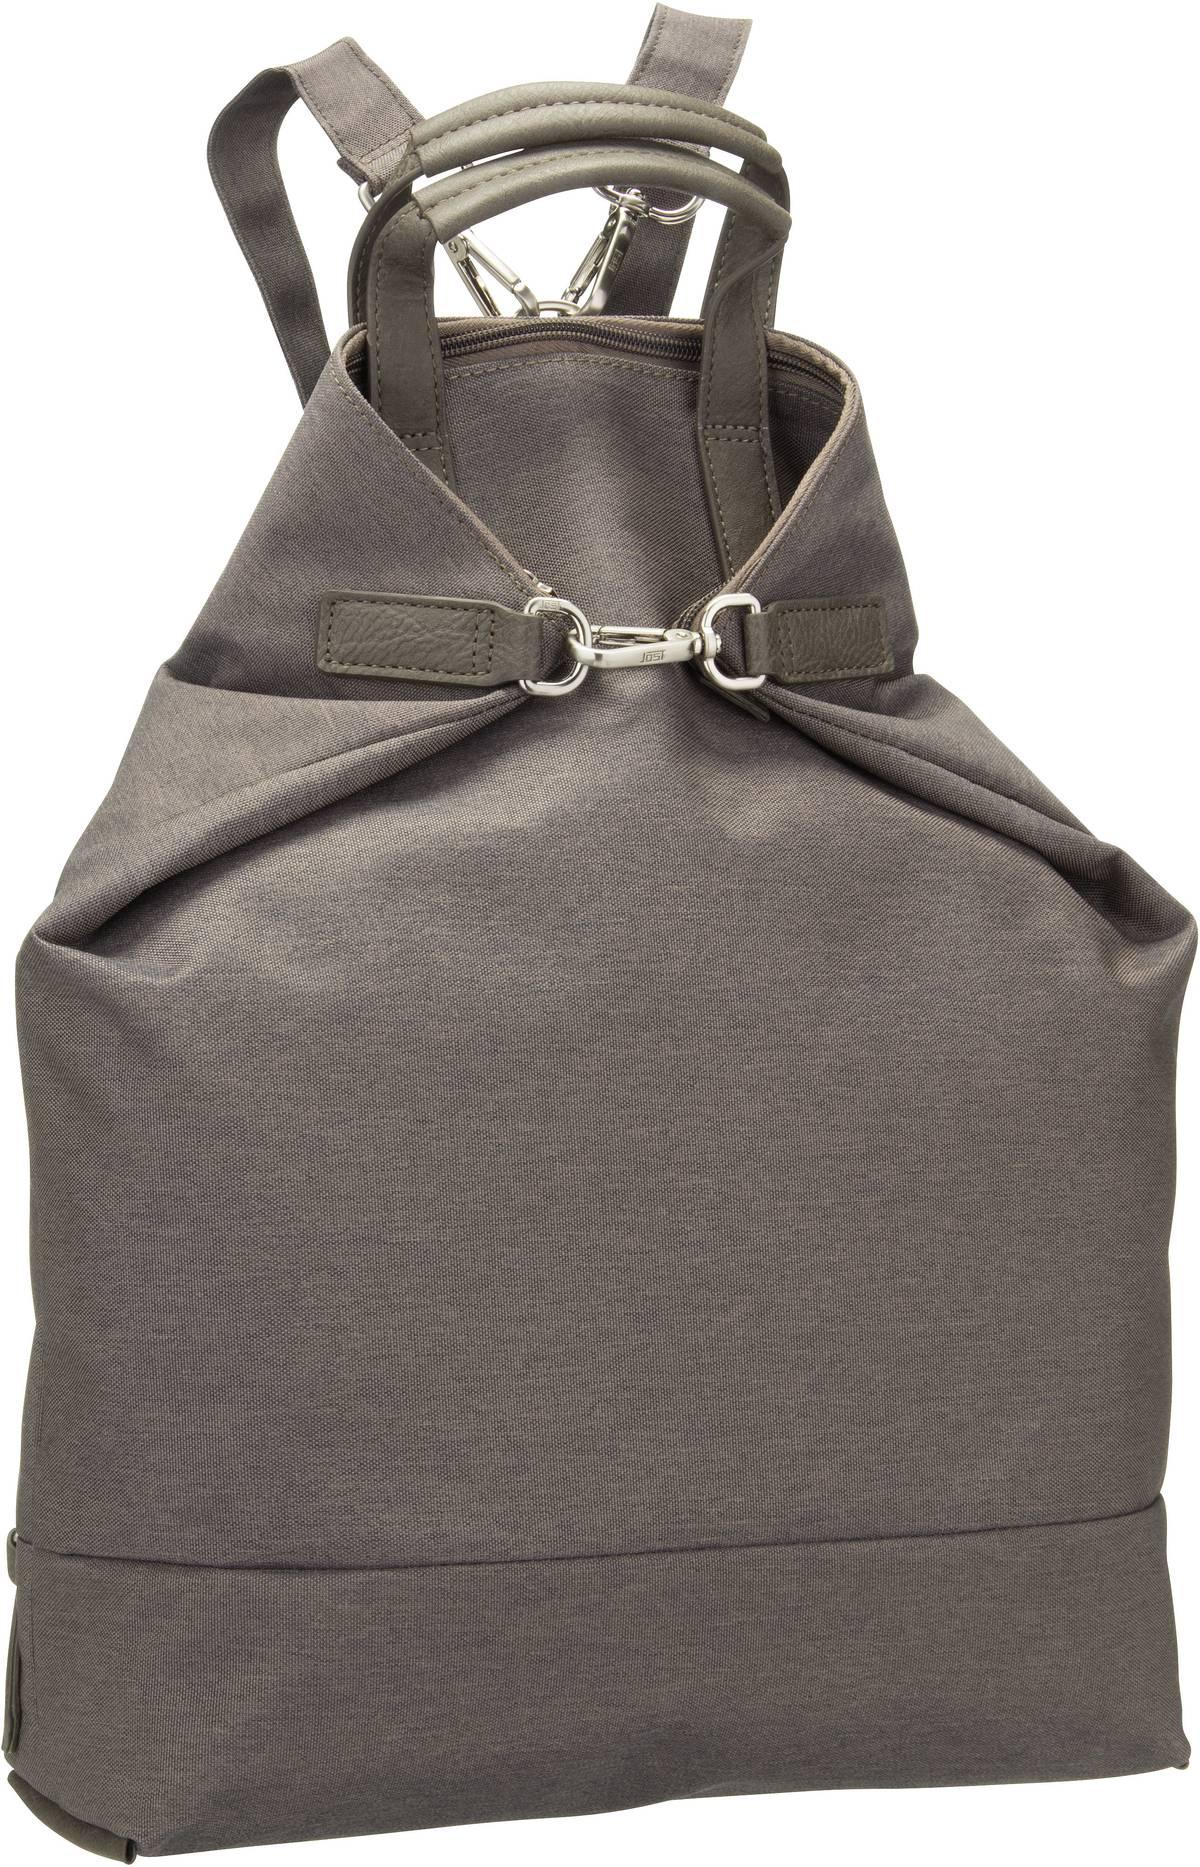 Jost Rucksack / Daypack 1105 X-Change Bag M Taupe